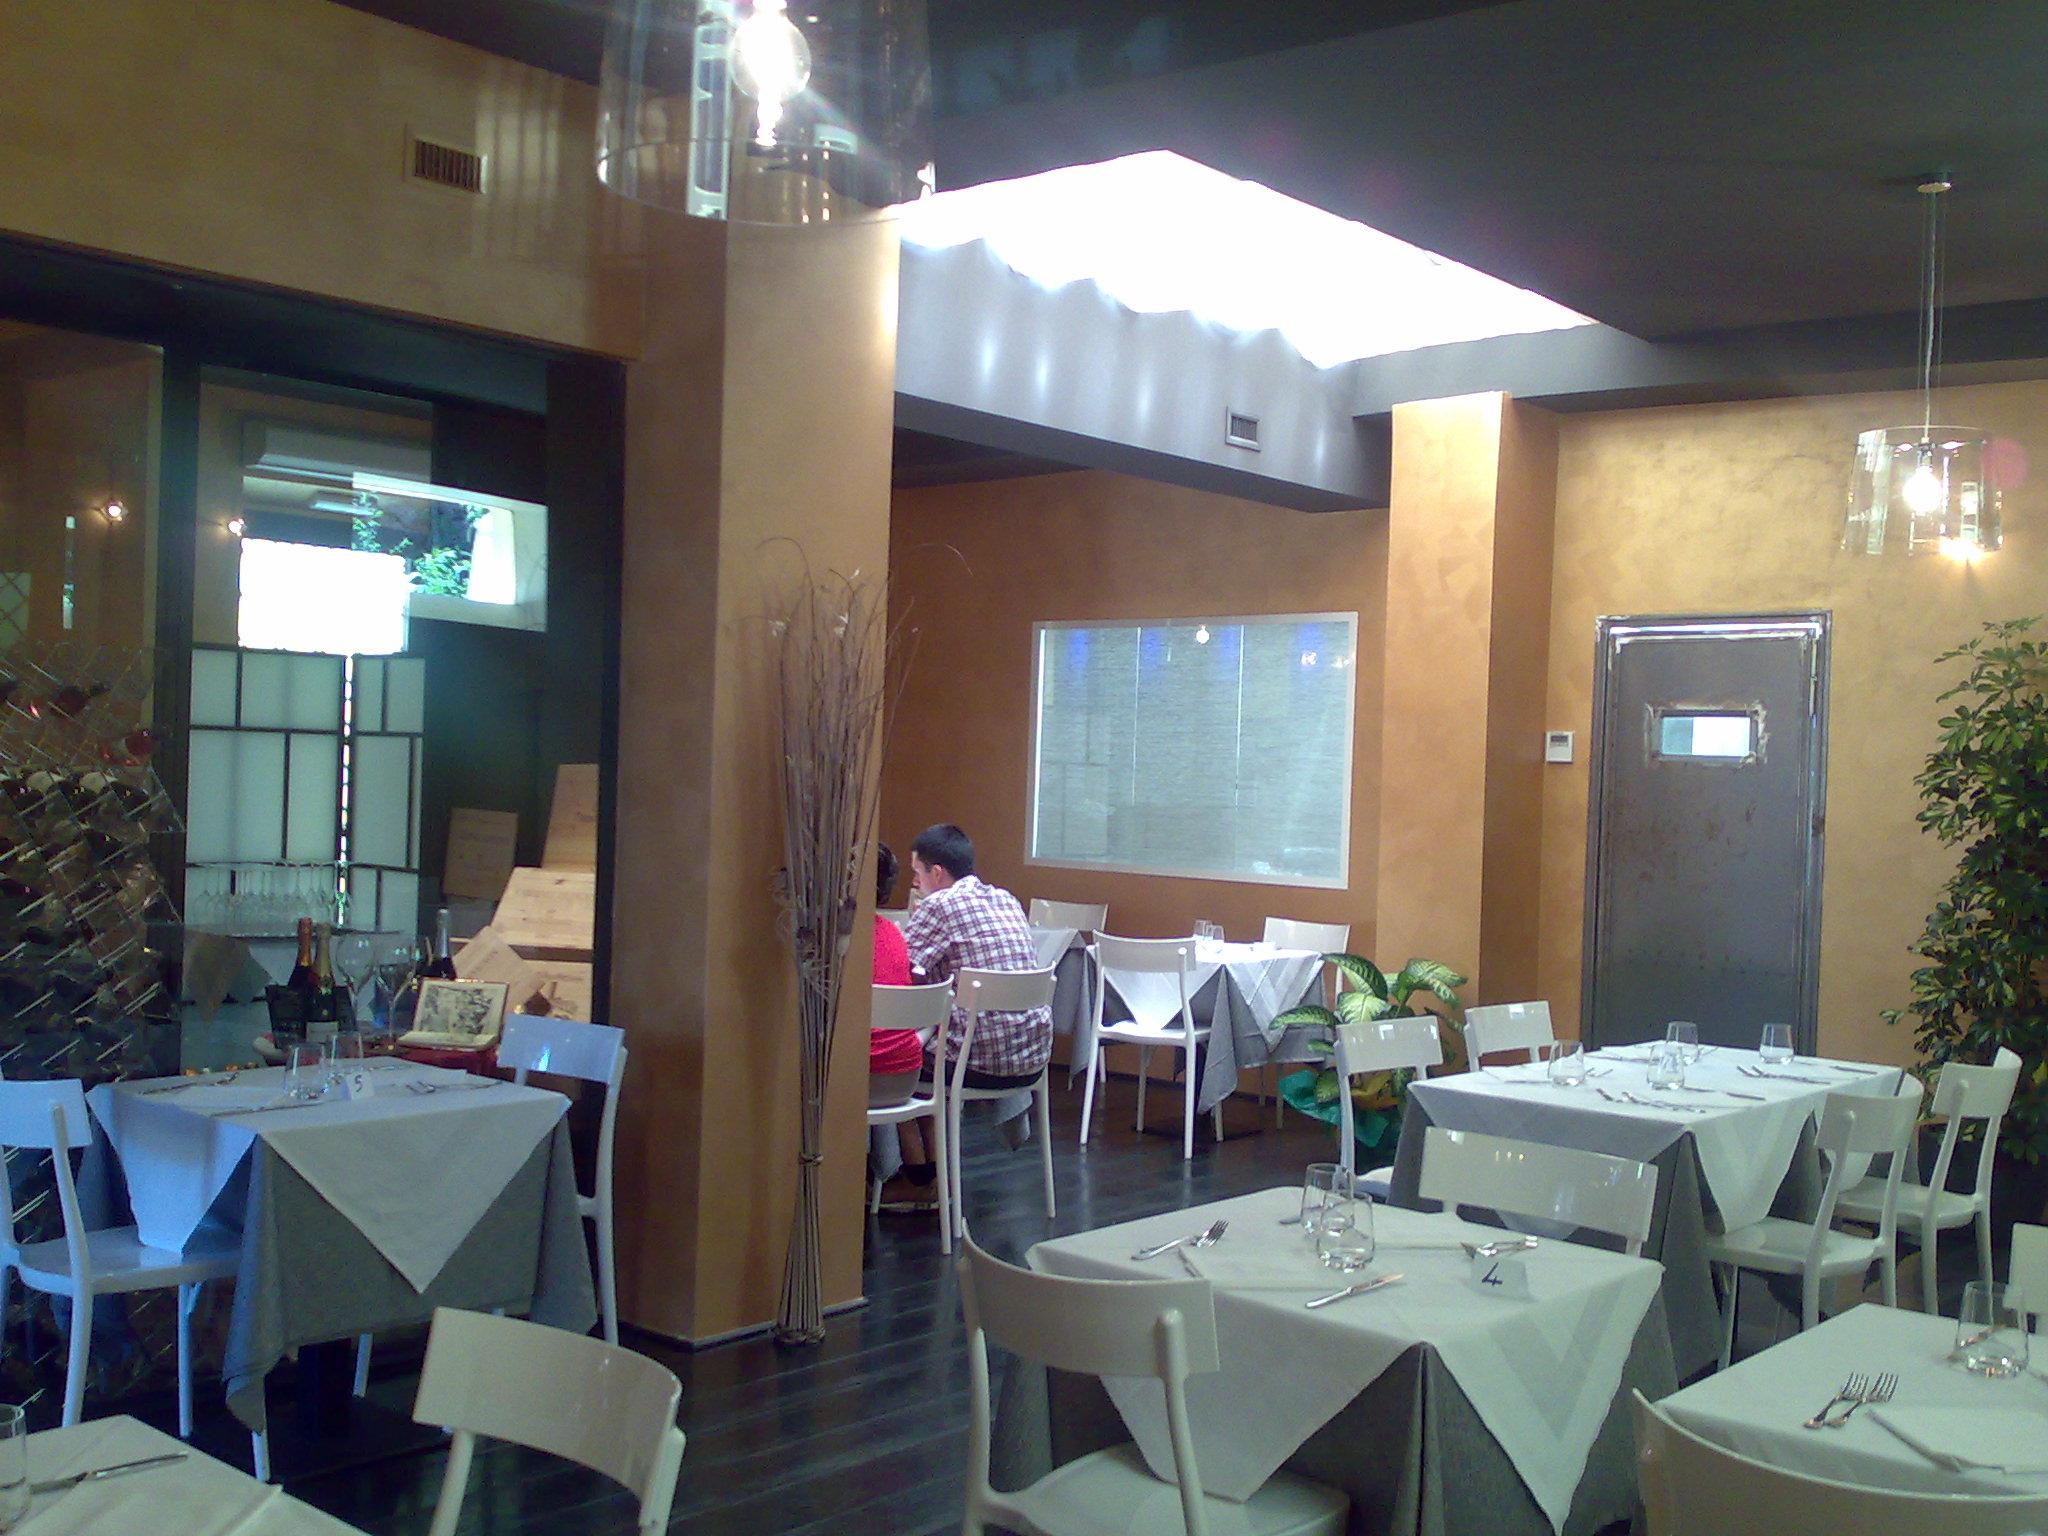 ristorante opera cucina romana - foto 1 - Ristoranti Cucina Romana